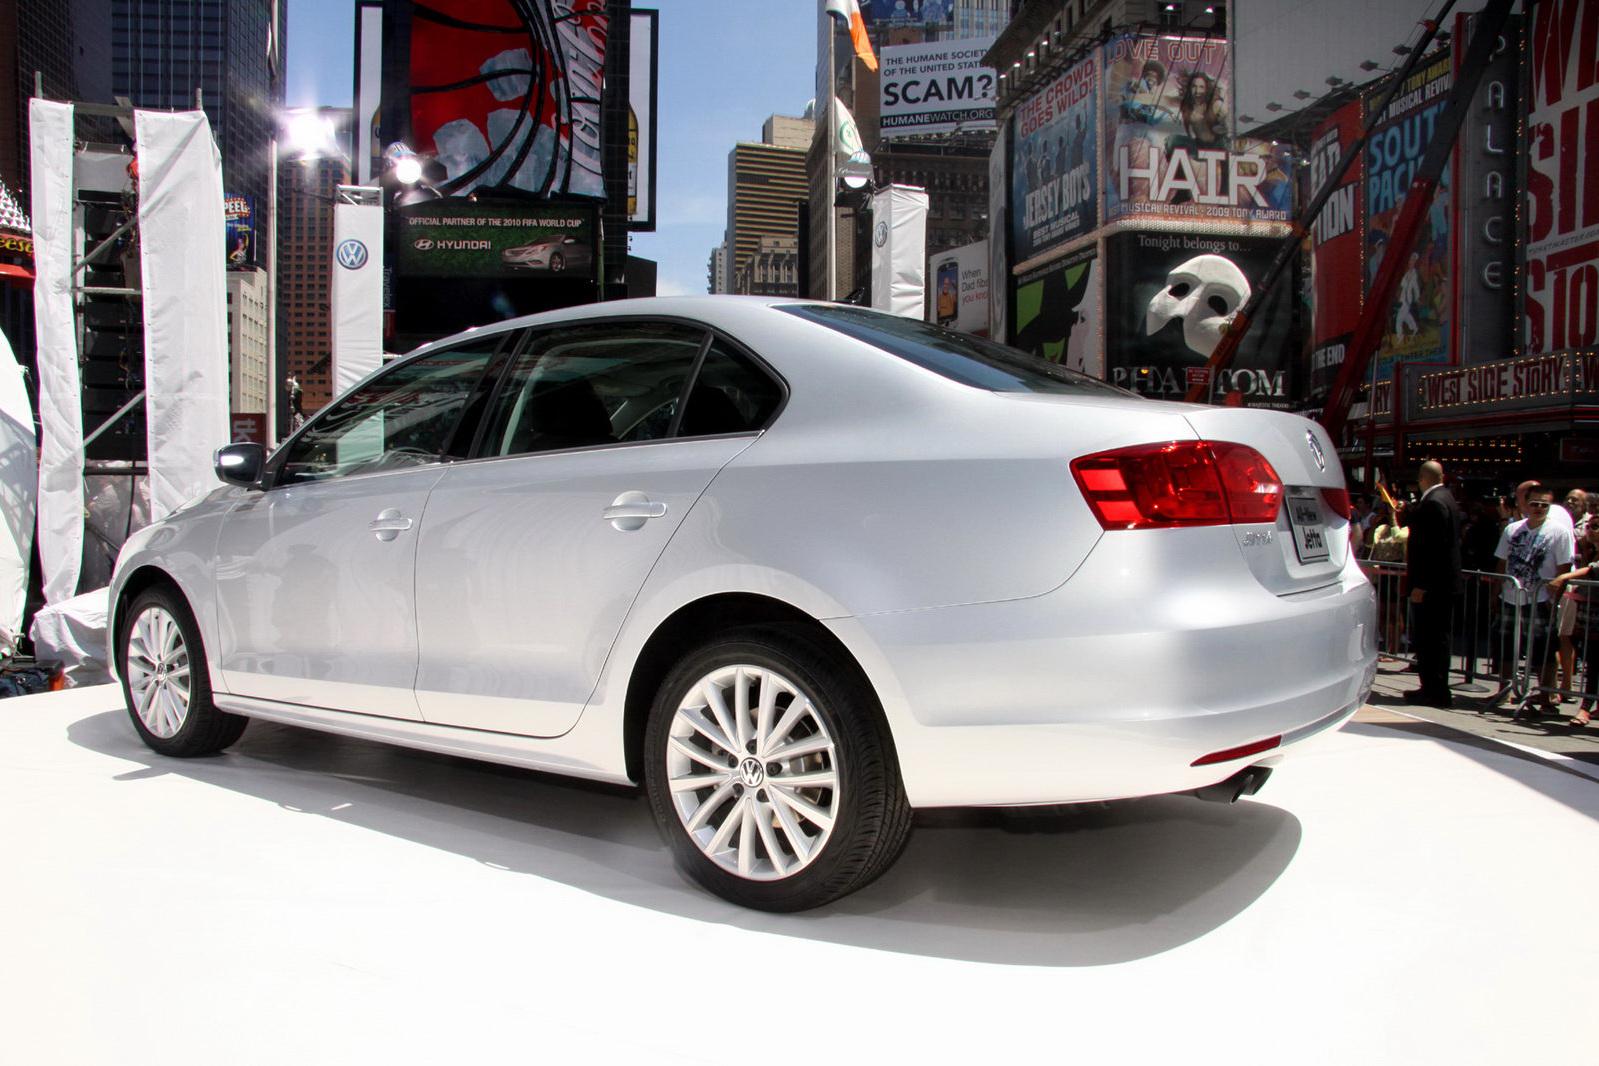 http://1.bp.blogspot.com/_FoXyvaPSnVk/TBlbx8VGDCI/AAAAAAAC9_U/KLR_rhGRVRE/s1600/2011-Volkswagen-Jetta-New-York-12.jpg